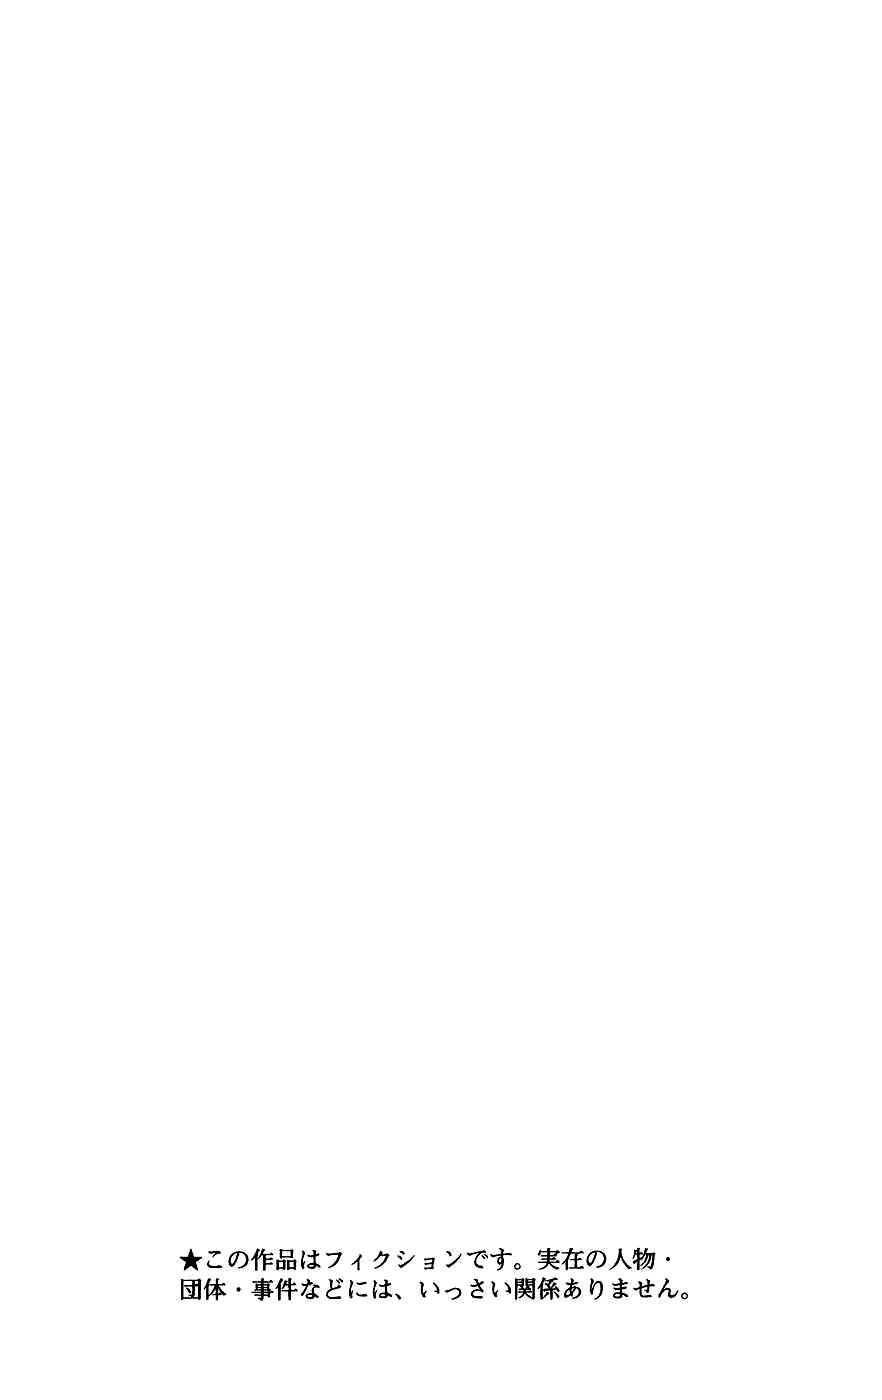 Манга Любовные неприятности / To Love-Ru  - Том 9 Глава 71 Страница 7